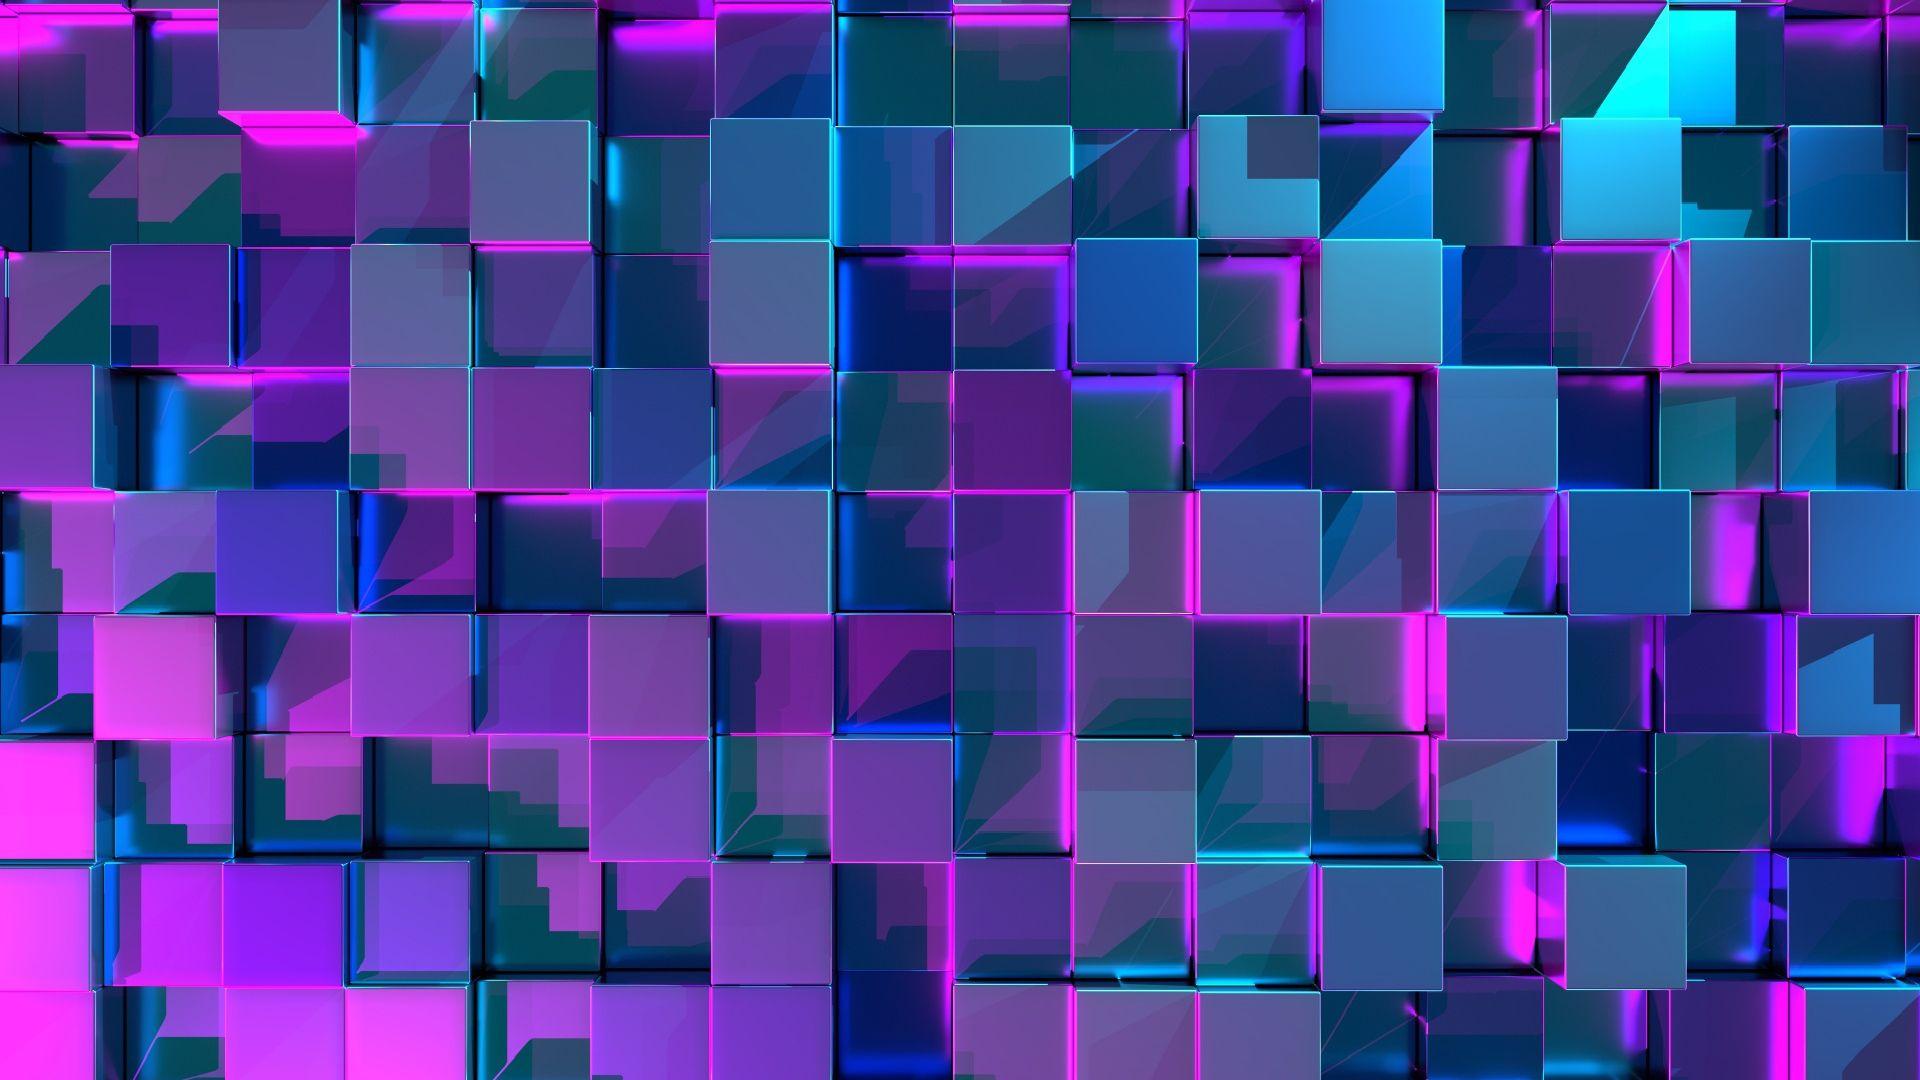 Blue Cubes Purple Light Background Free Wallpaper Hq Hd Wallpaper Lit Wallpaper Graphic Wallpaper